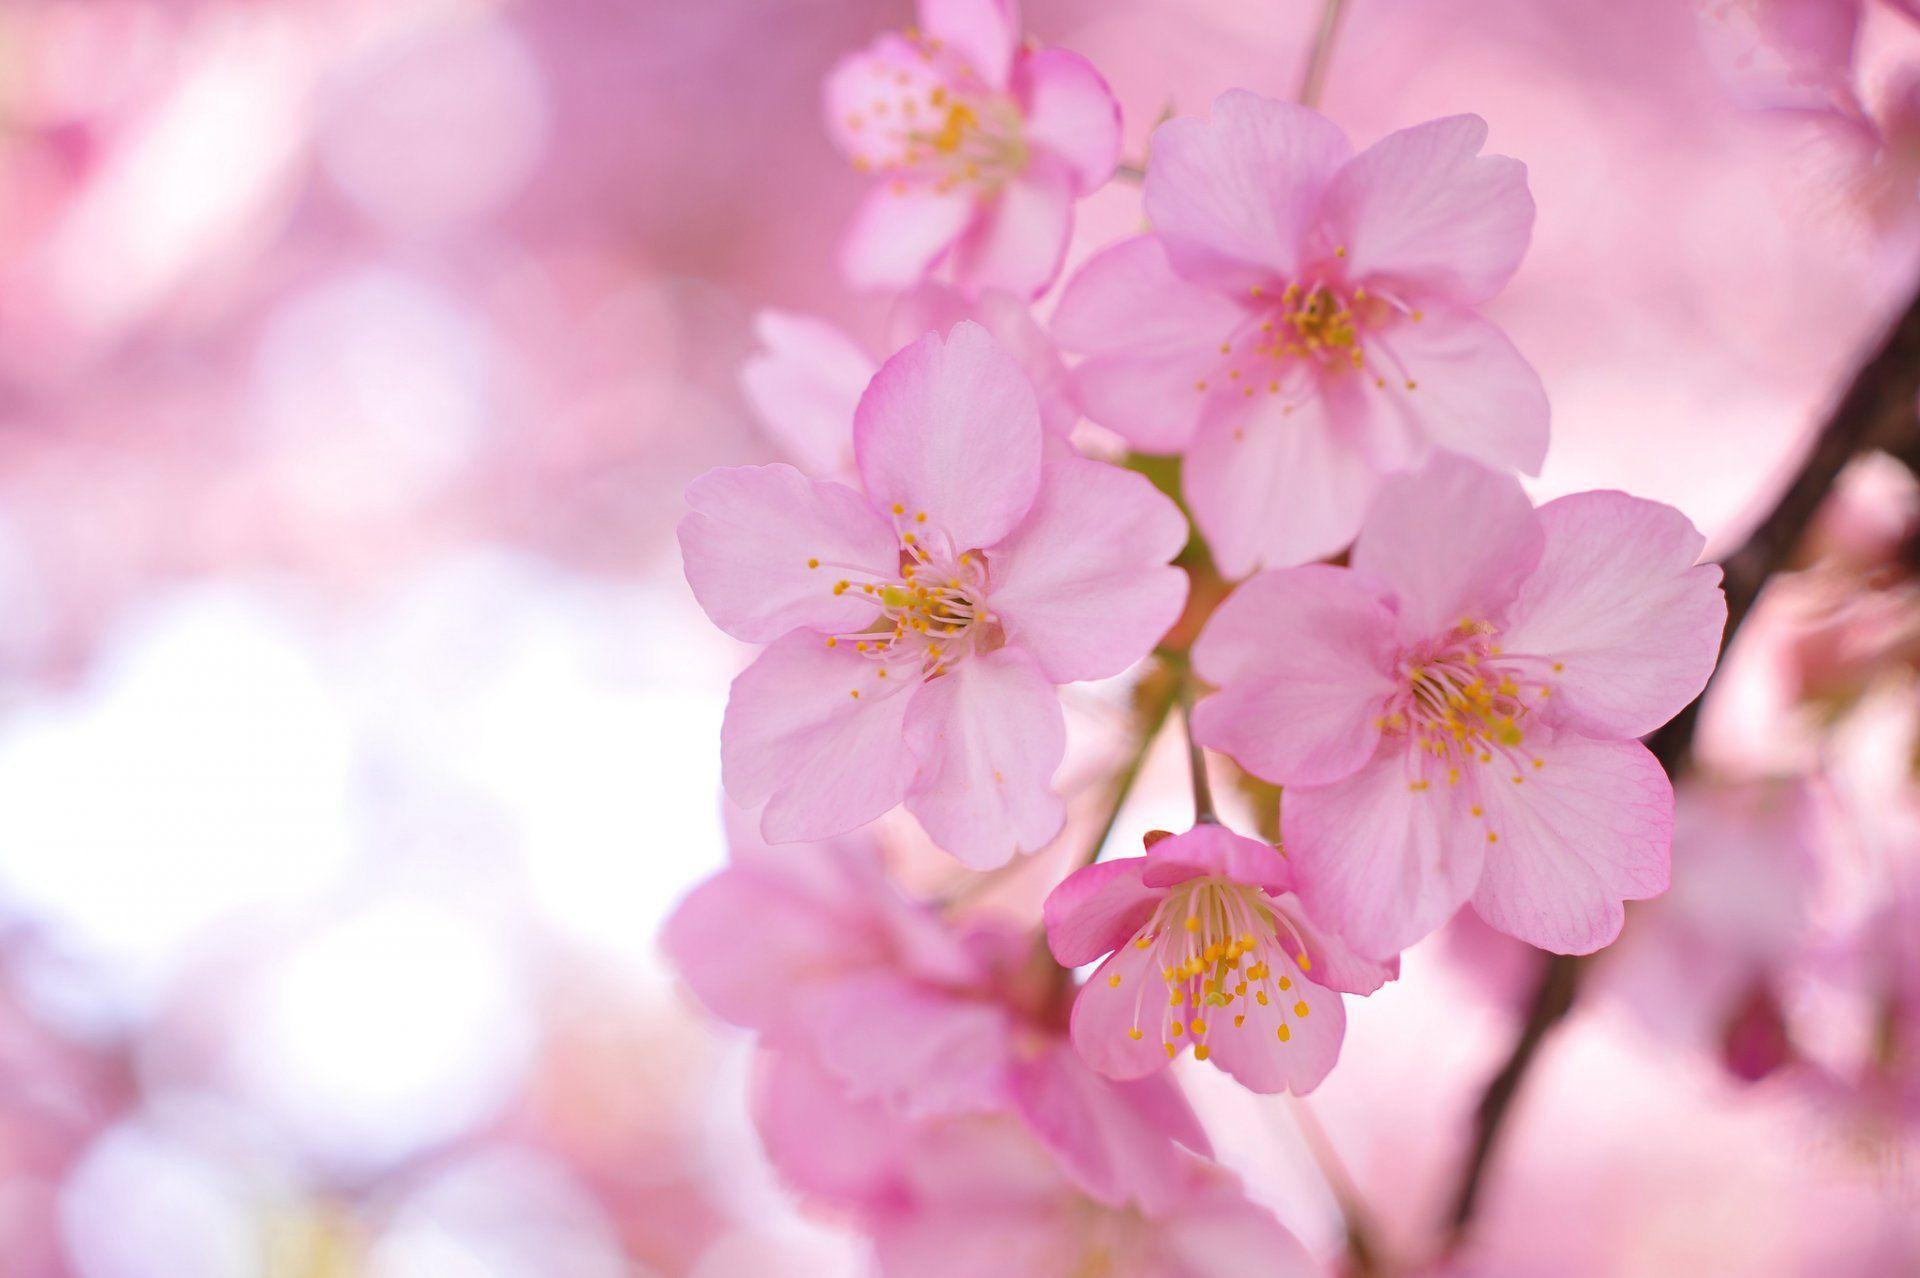 Sakura Tree Branches Pink Flower Petals Blur Hd Wallpaper